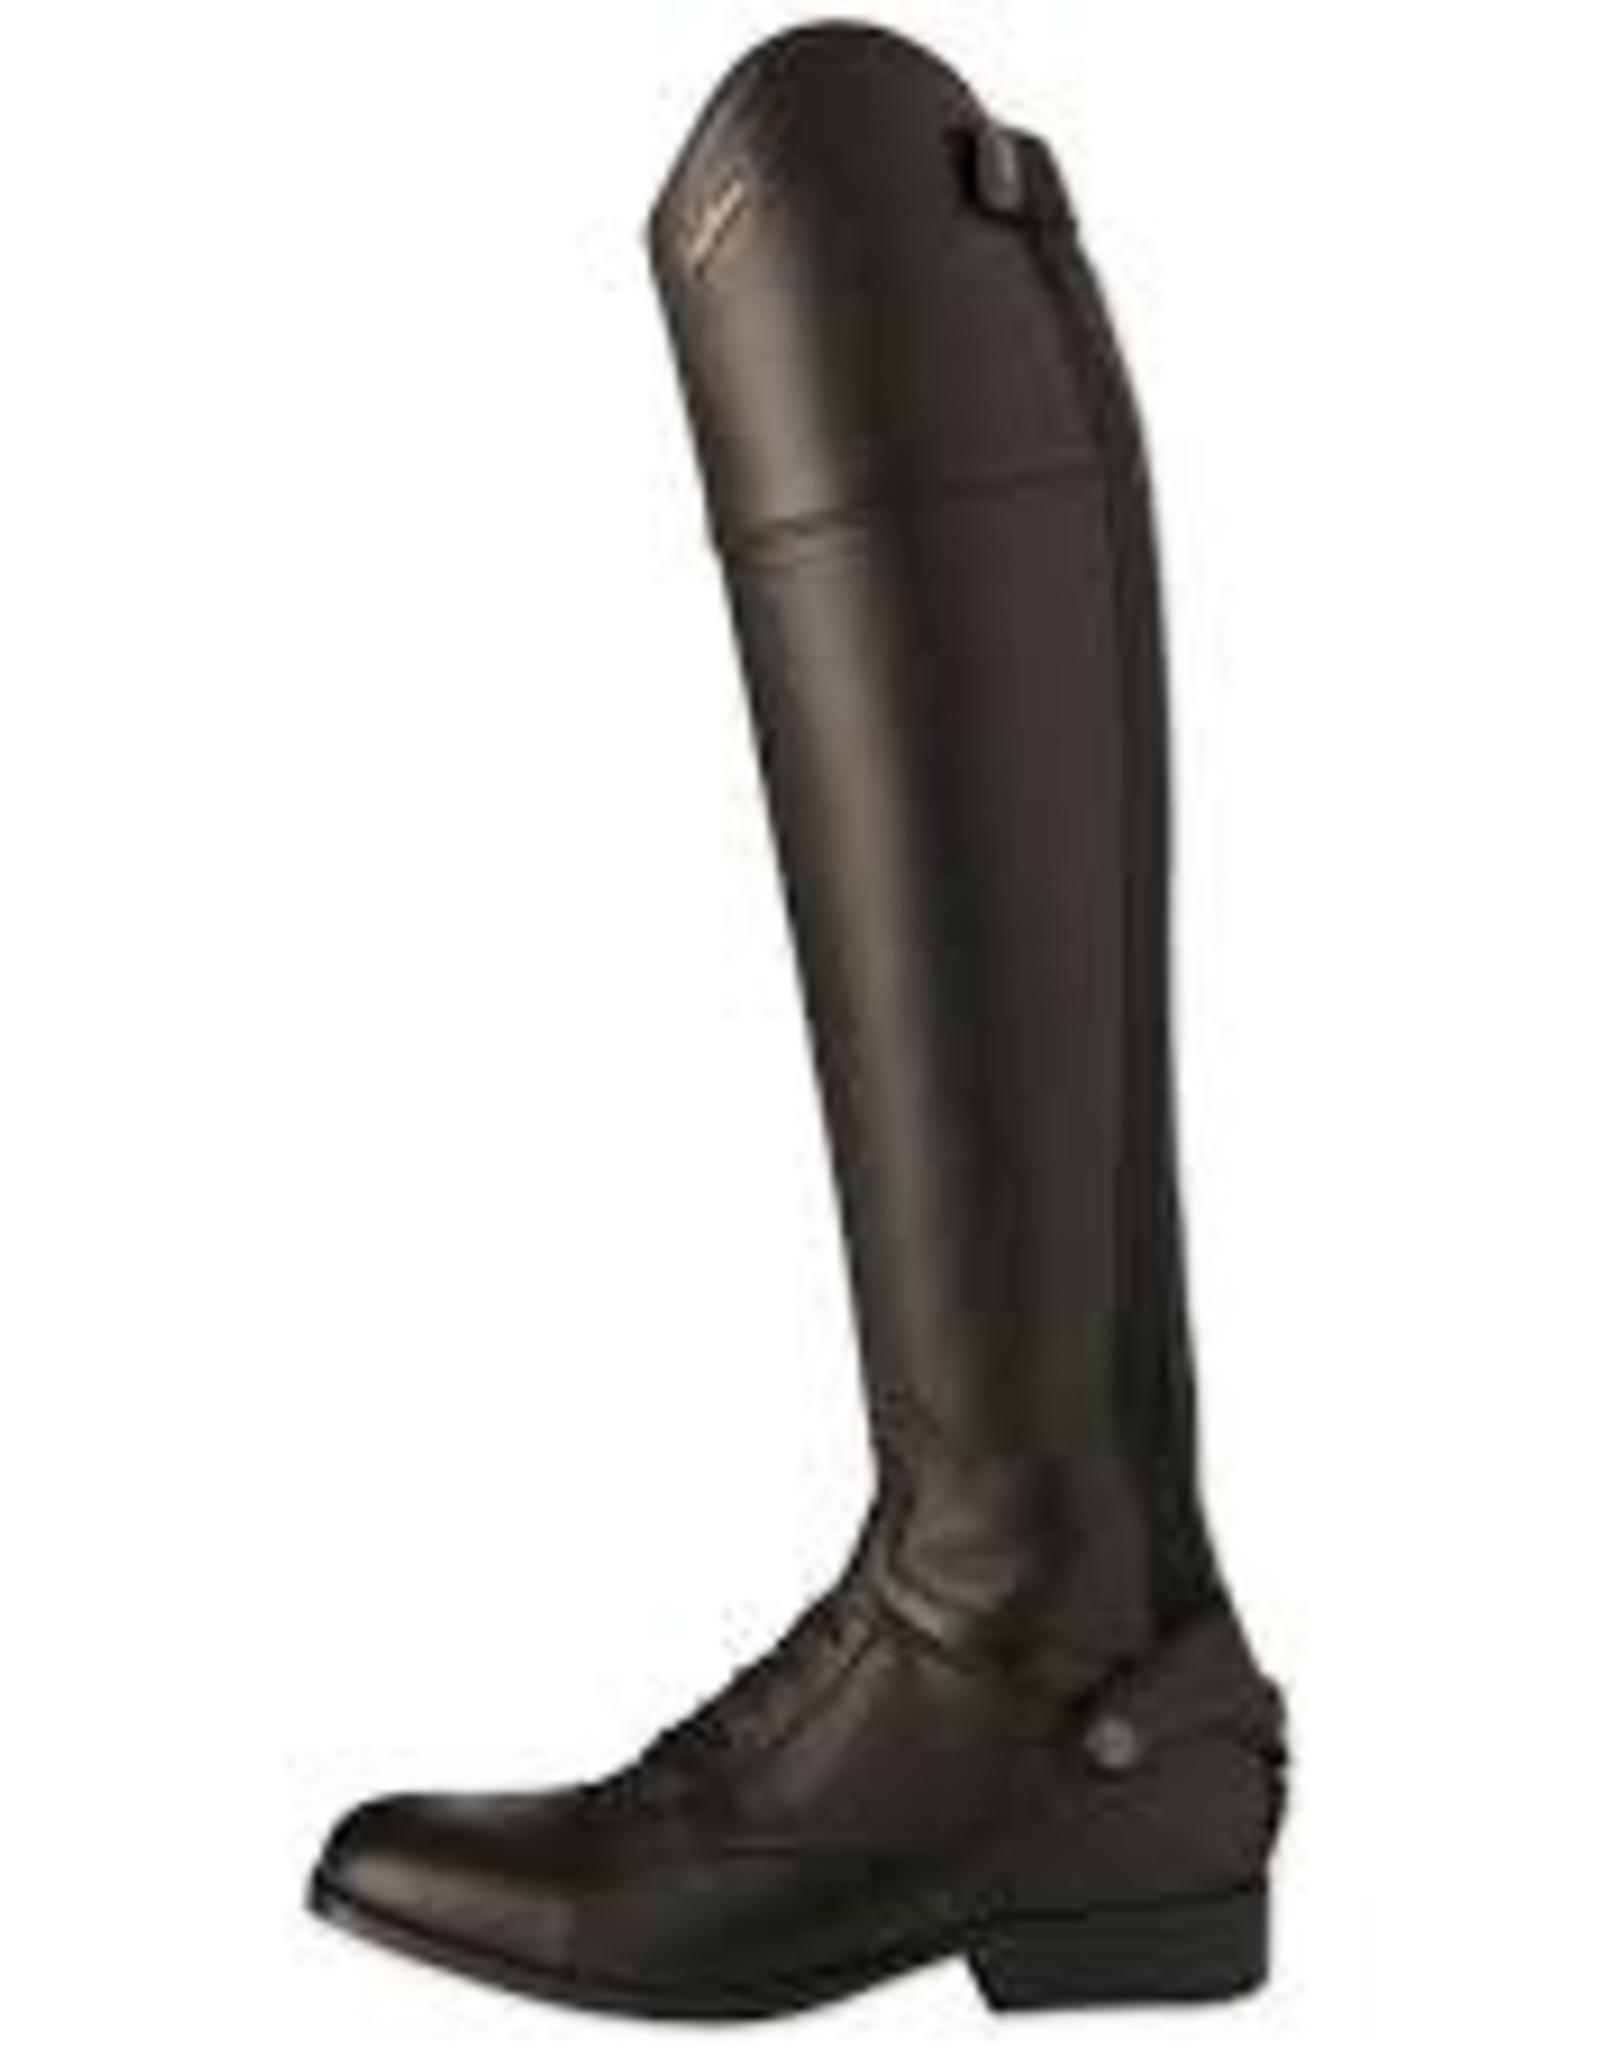 Boots Field Evolution Sergio